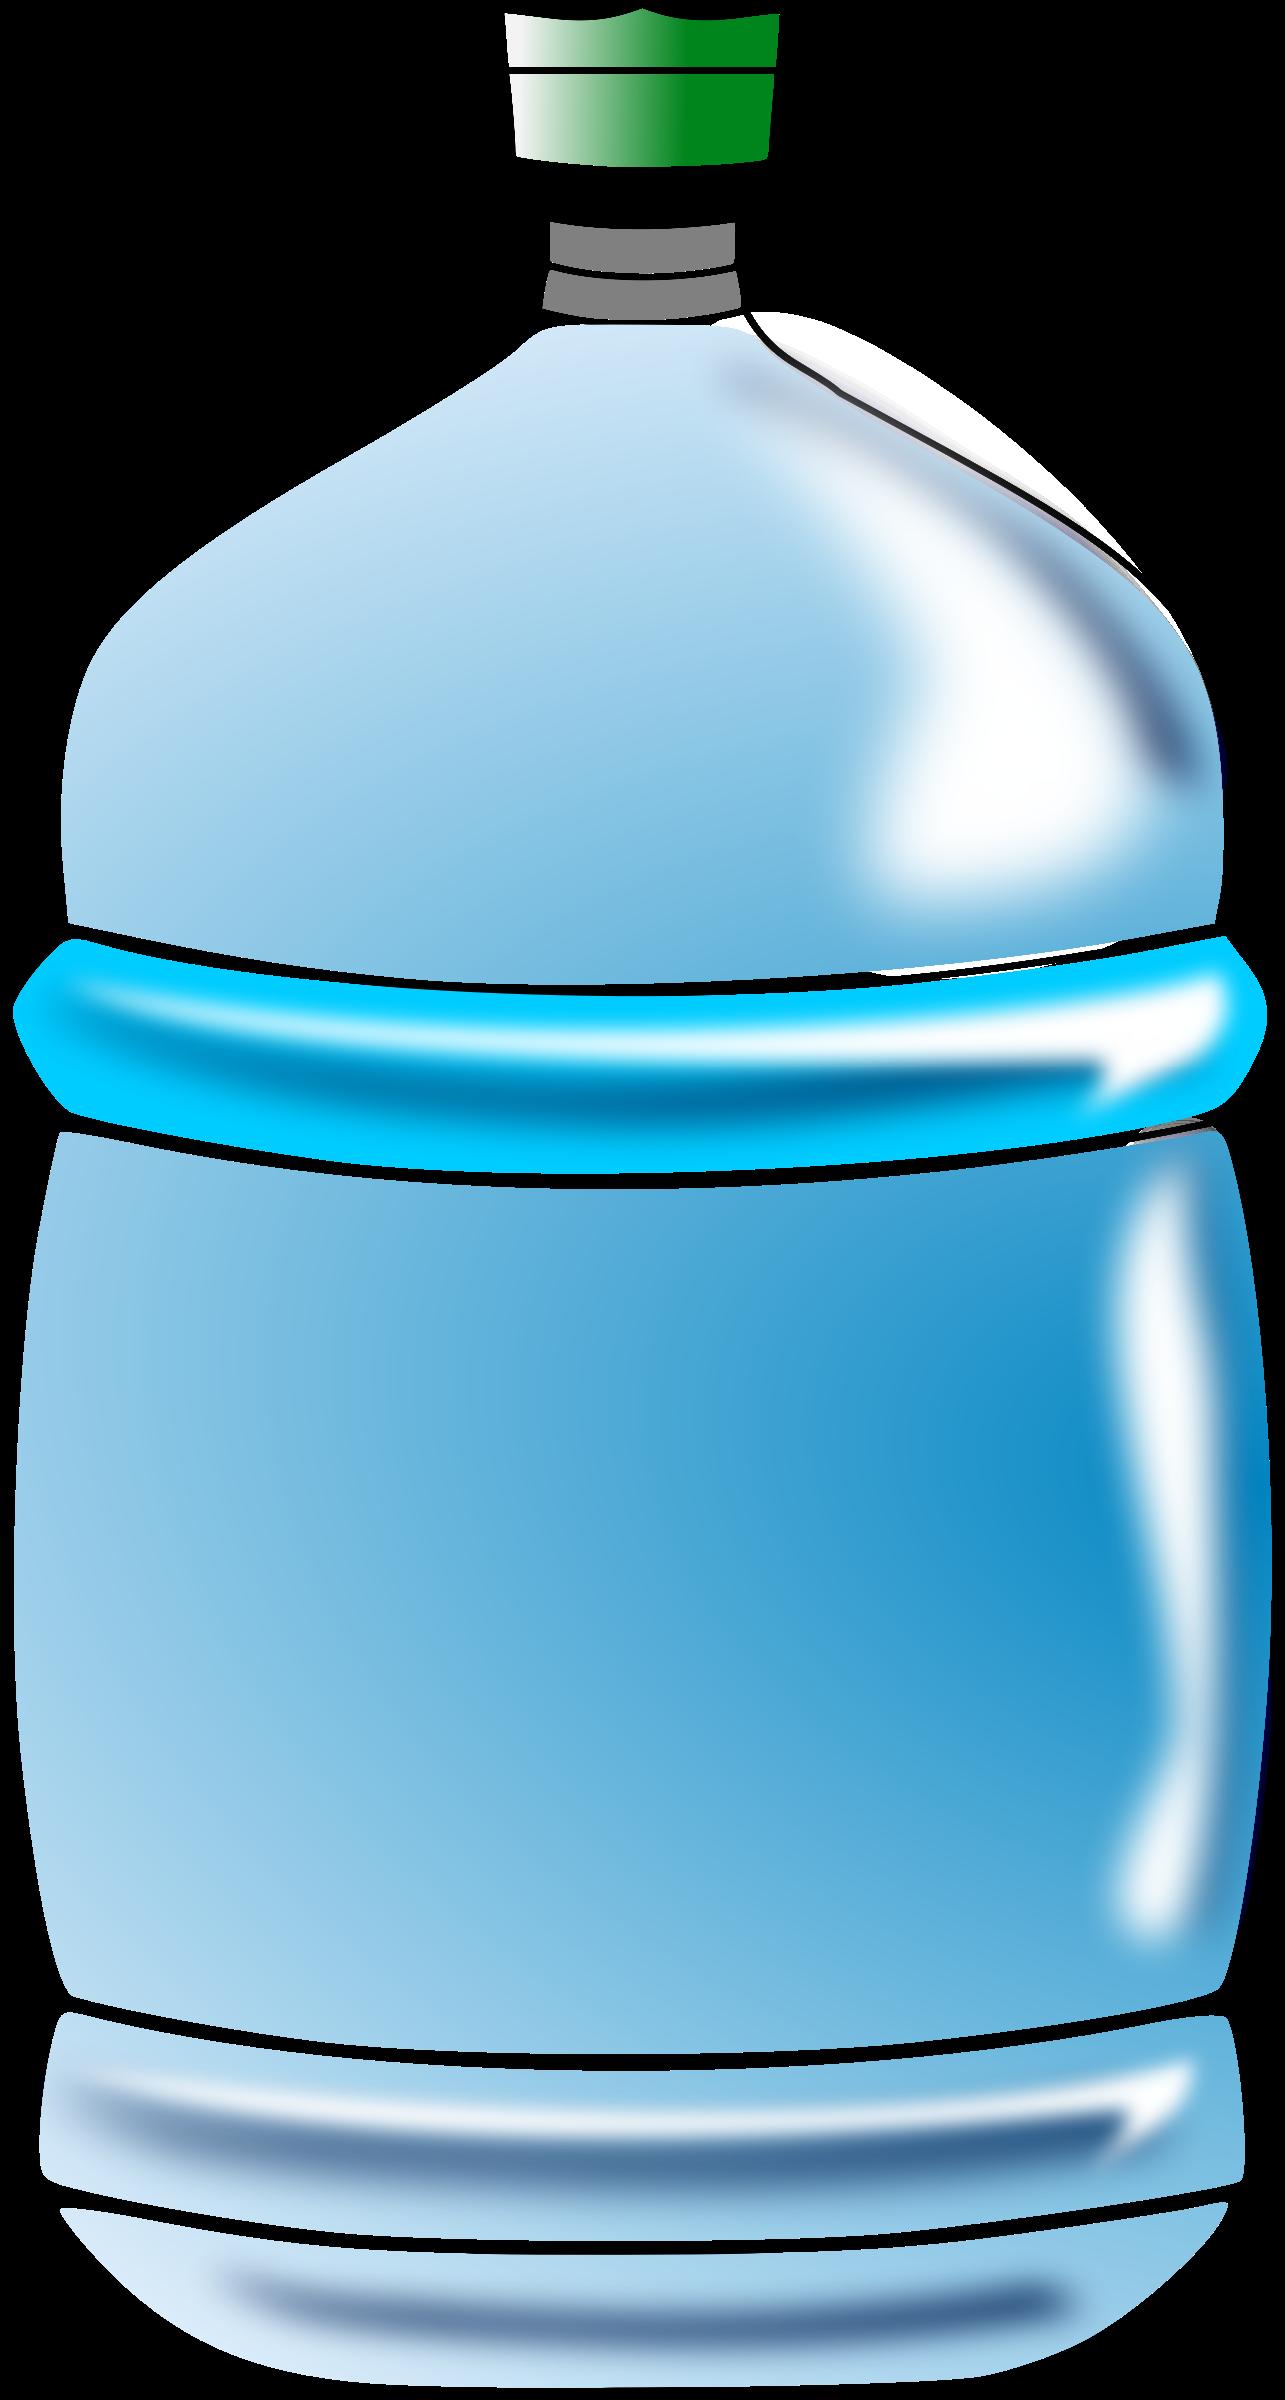 clip free library  collection of high. Carton clipart gallon water